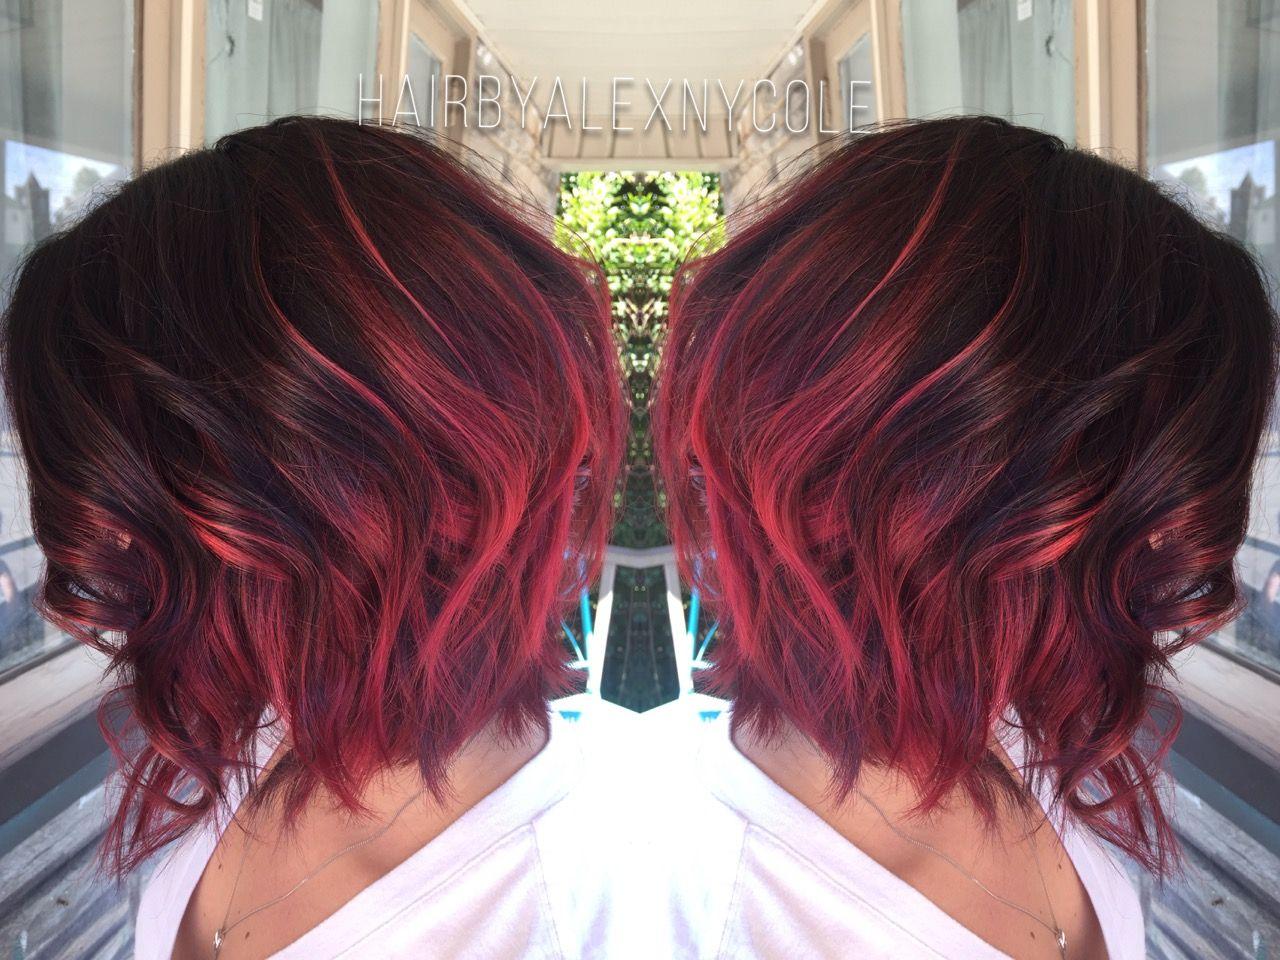 Ruby Red Ombre On Short Hair Http Niffler Elm Tumblr Com Post 157401012081 Asian Guys Hairstyles 2017 Short Ha Short Ombre Hair Hair Styles Short Hair Styles